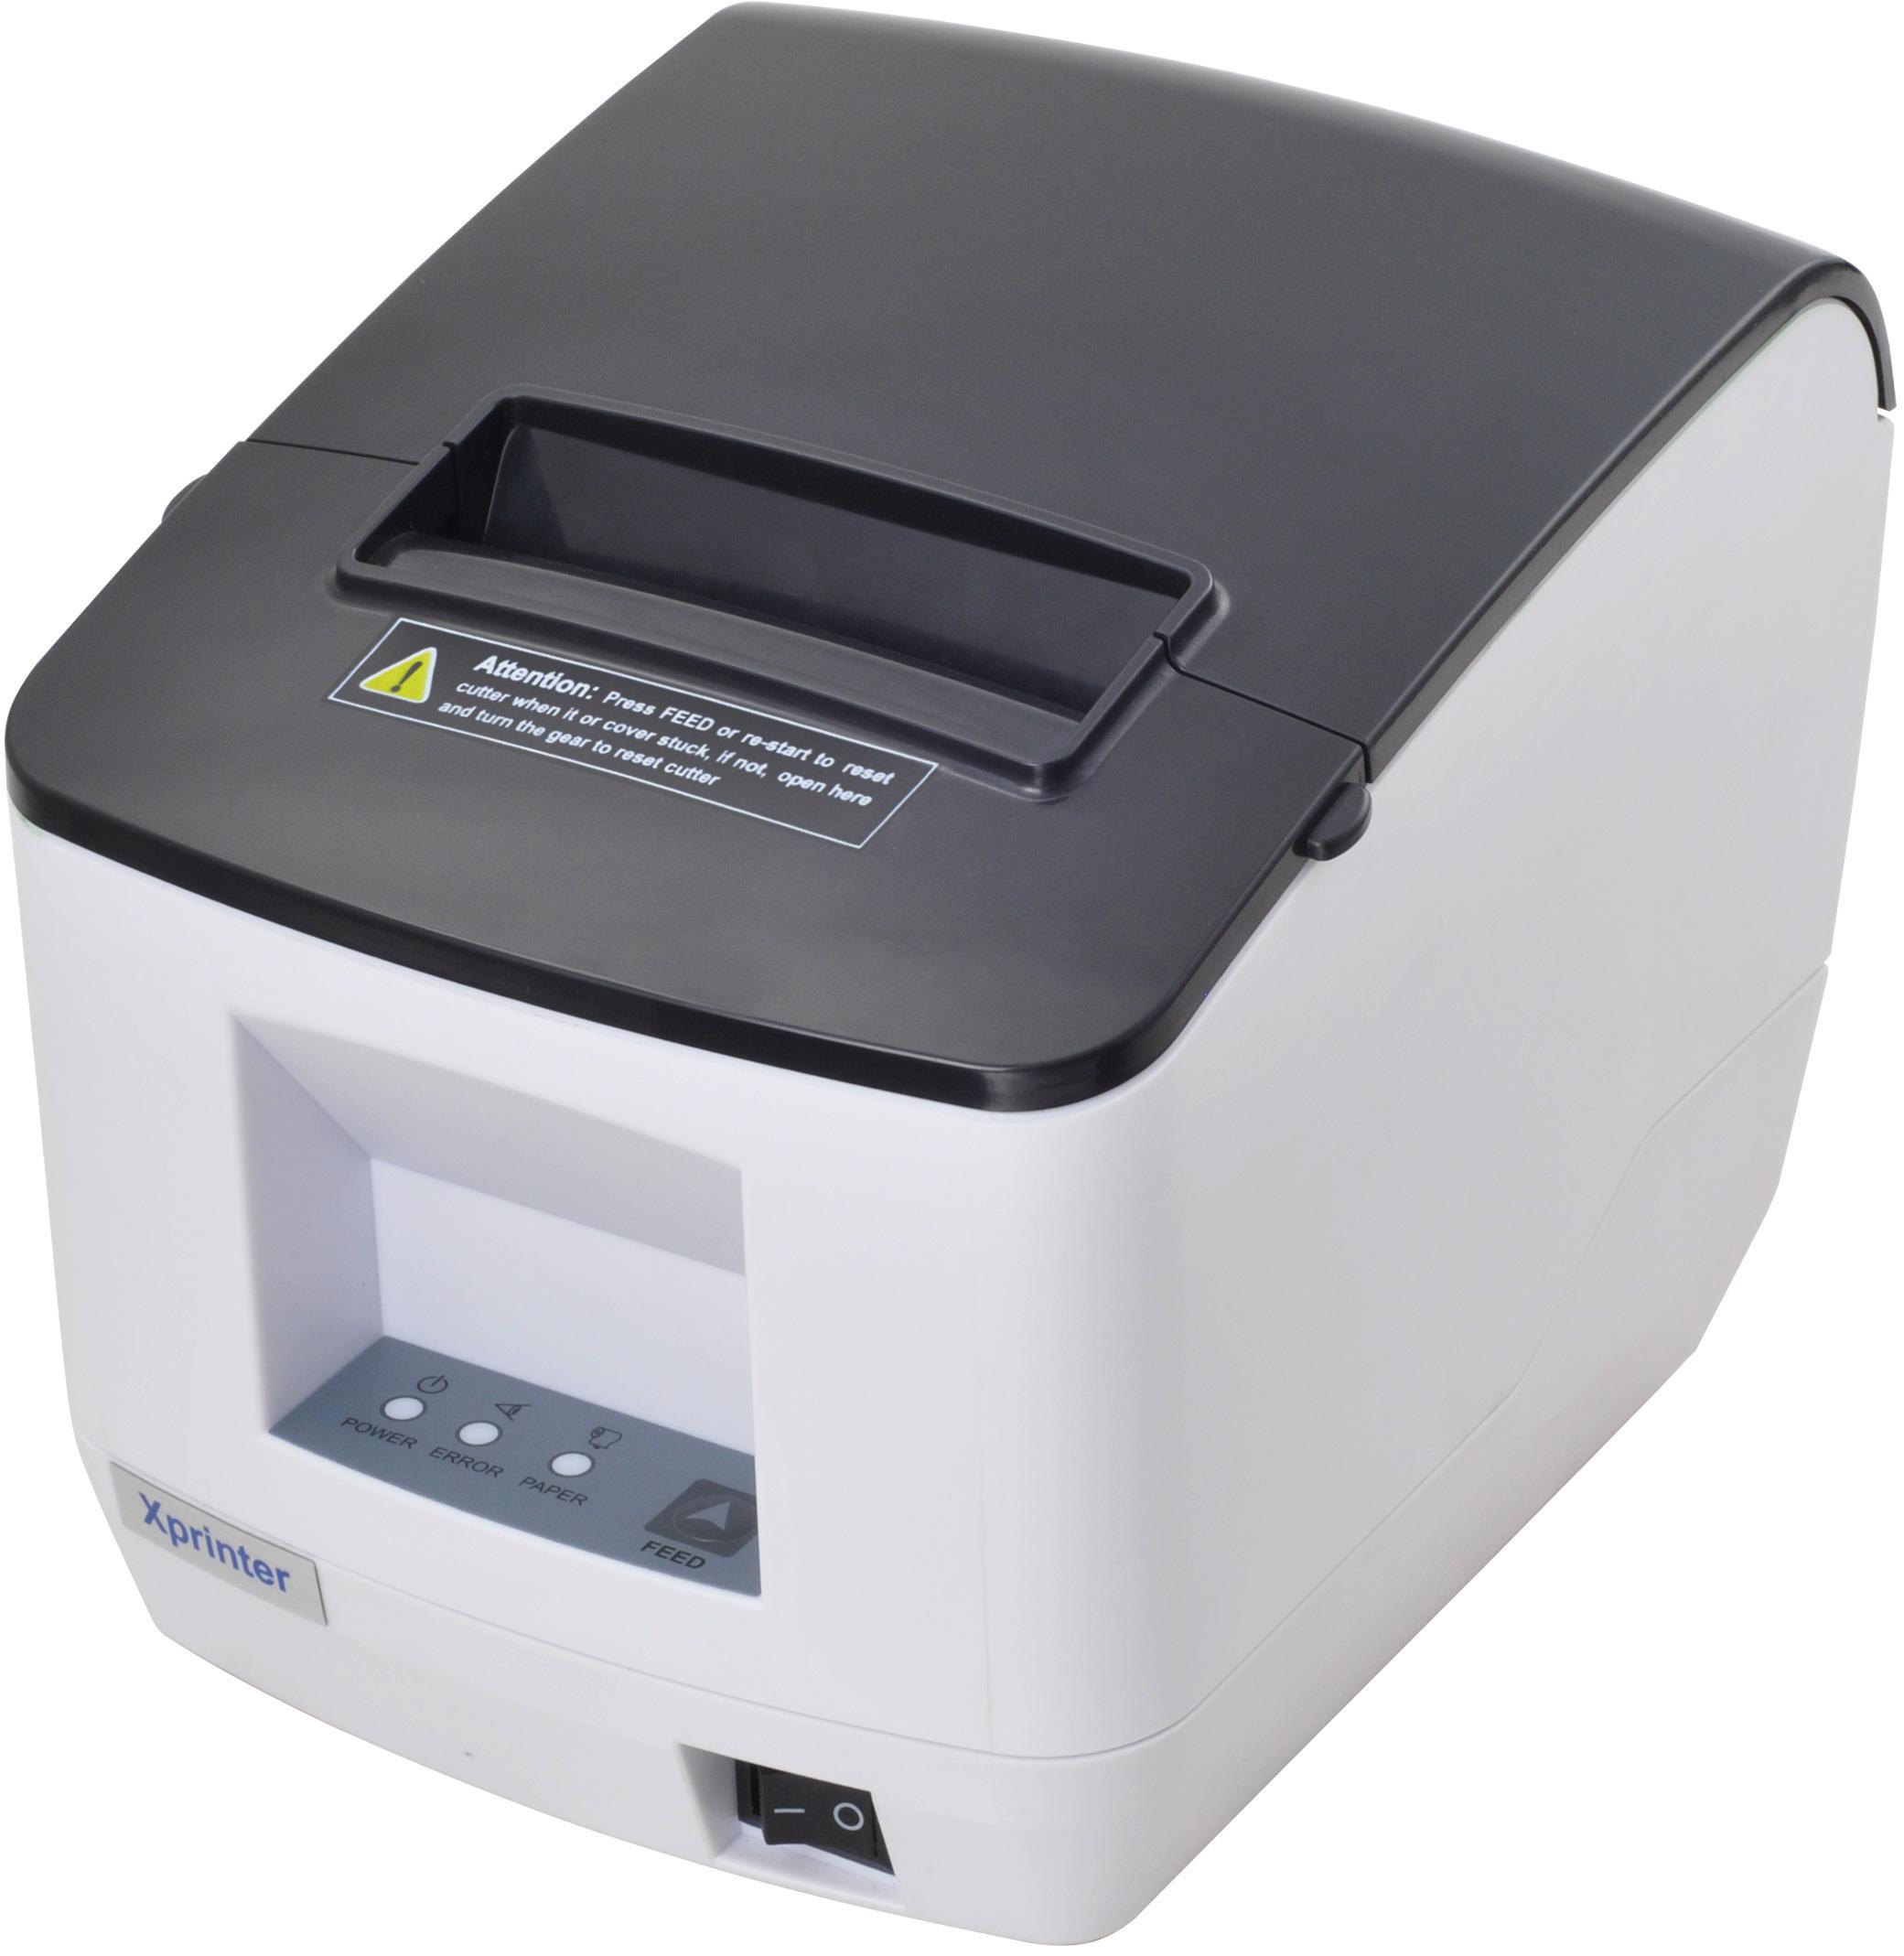 Printer Price in Bangladesh - Buy Printer Machine at Daraz